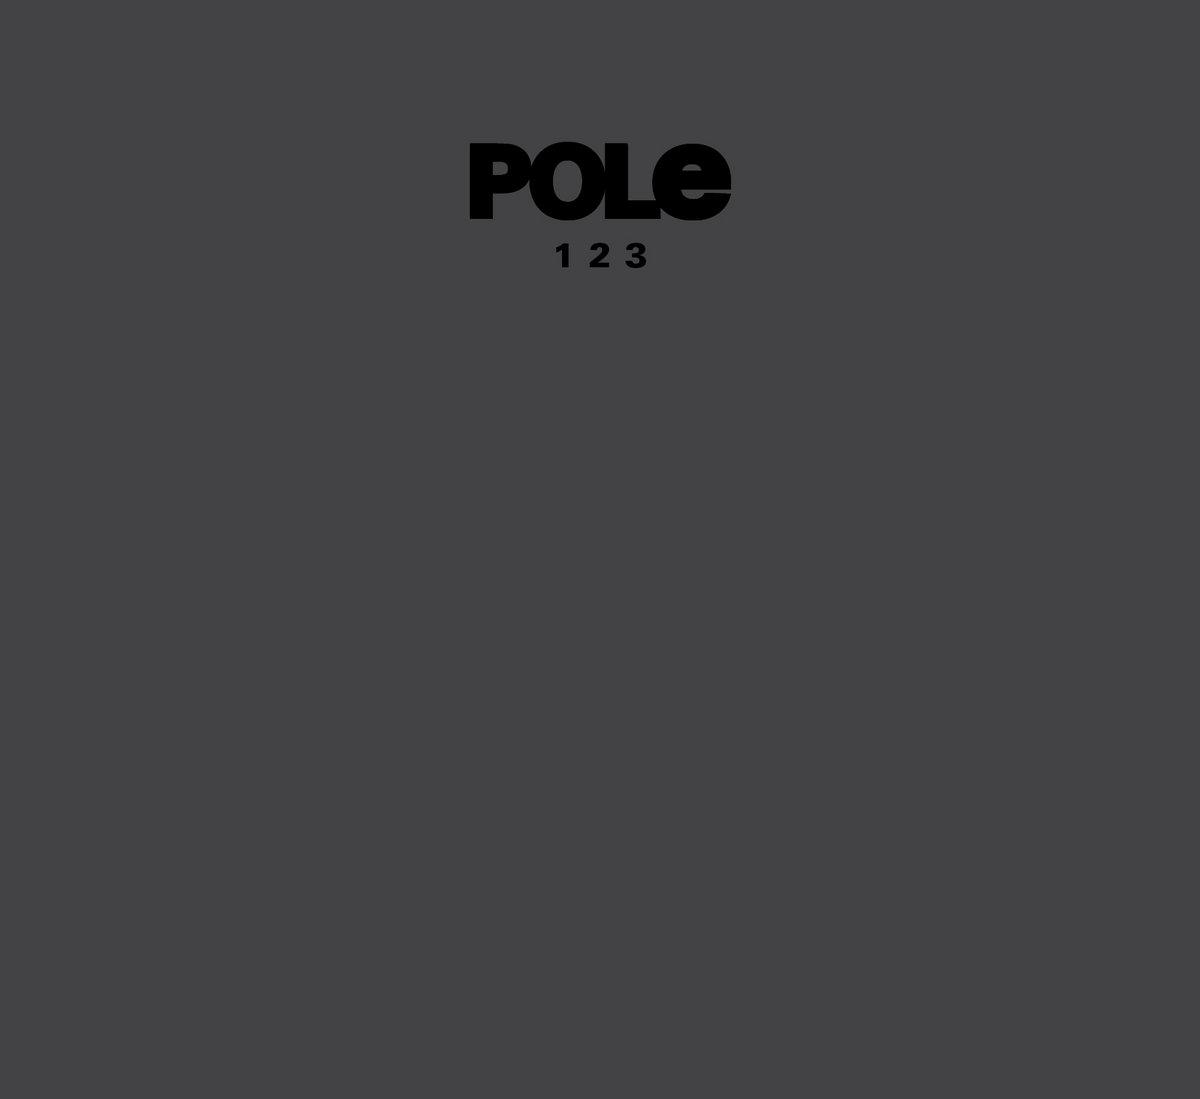 Pole: 1 2 3